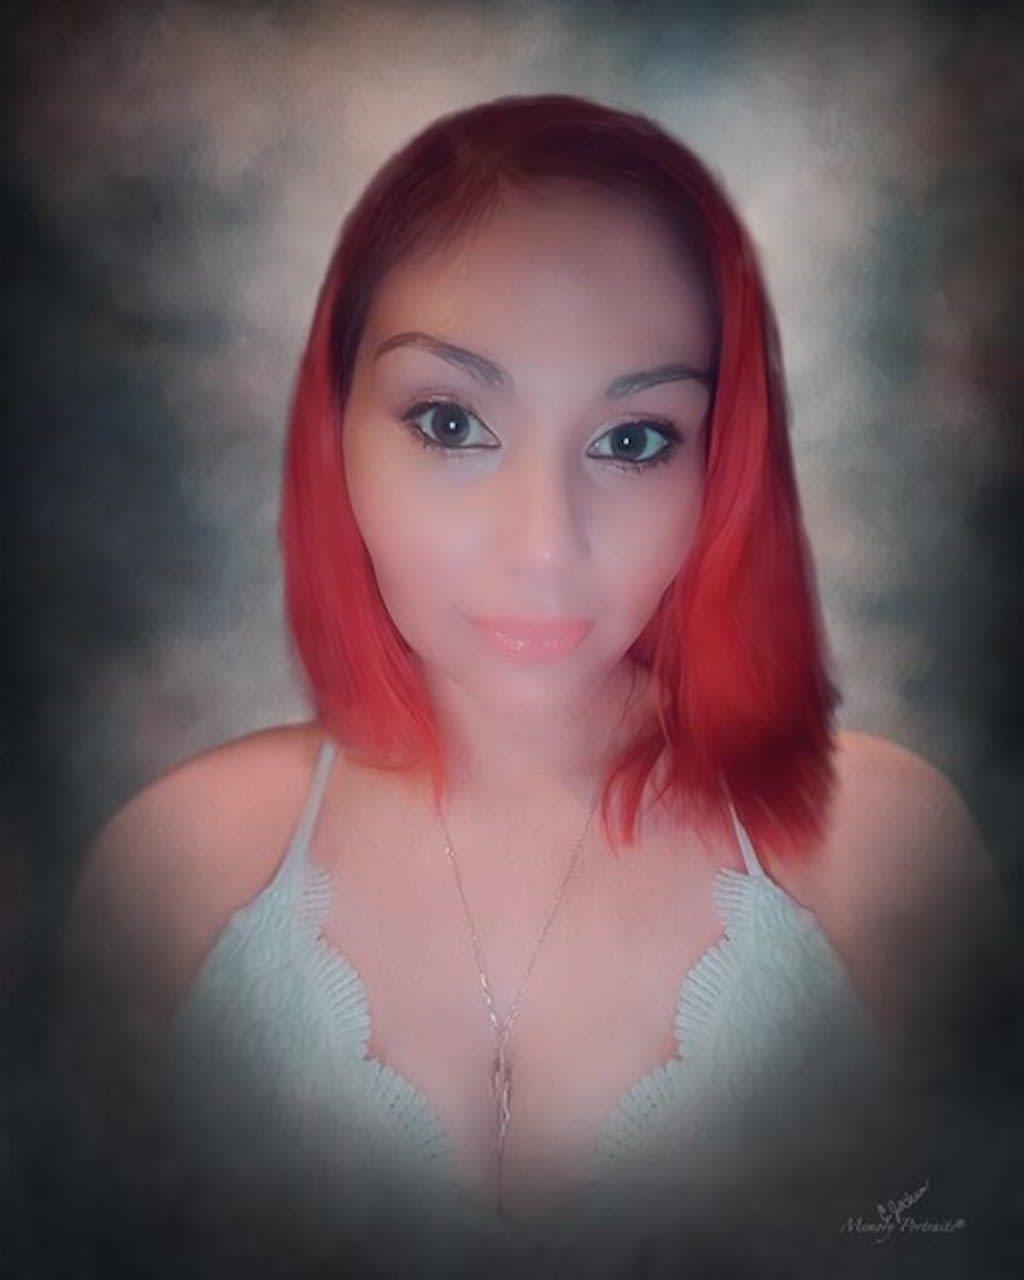 Jessica Ann Chávez